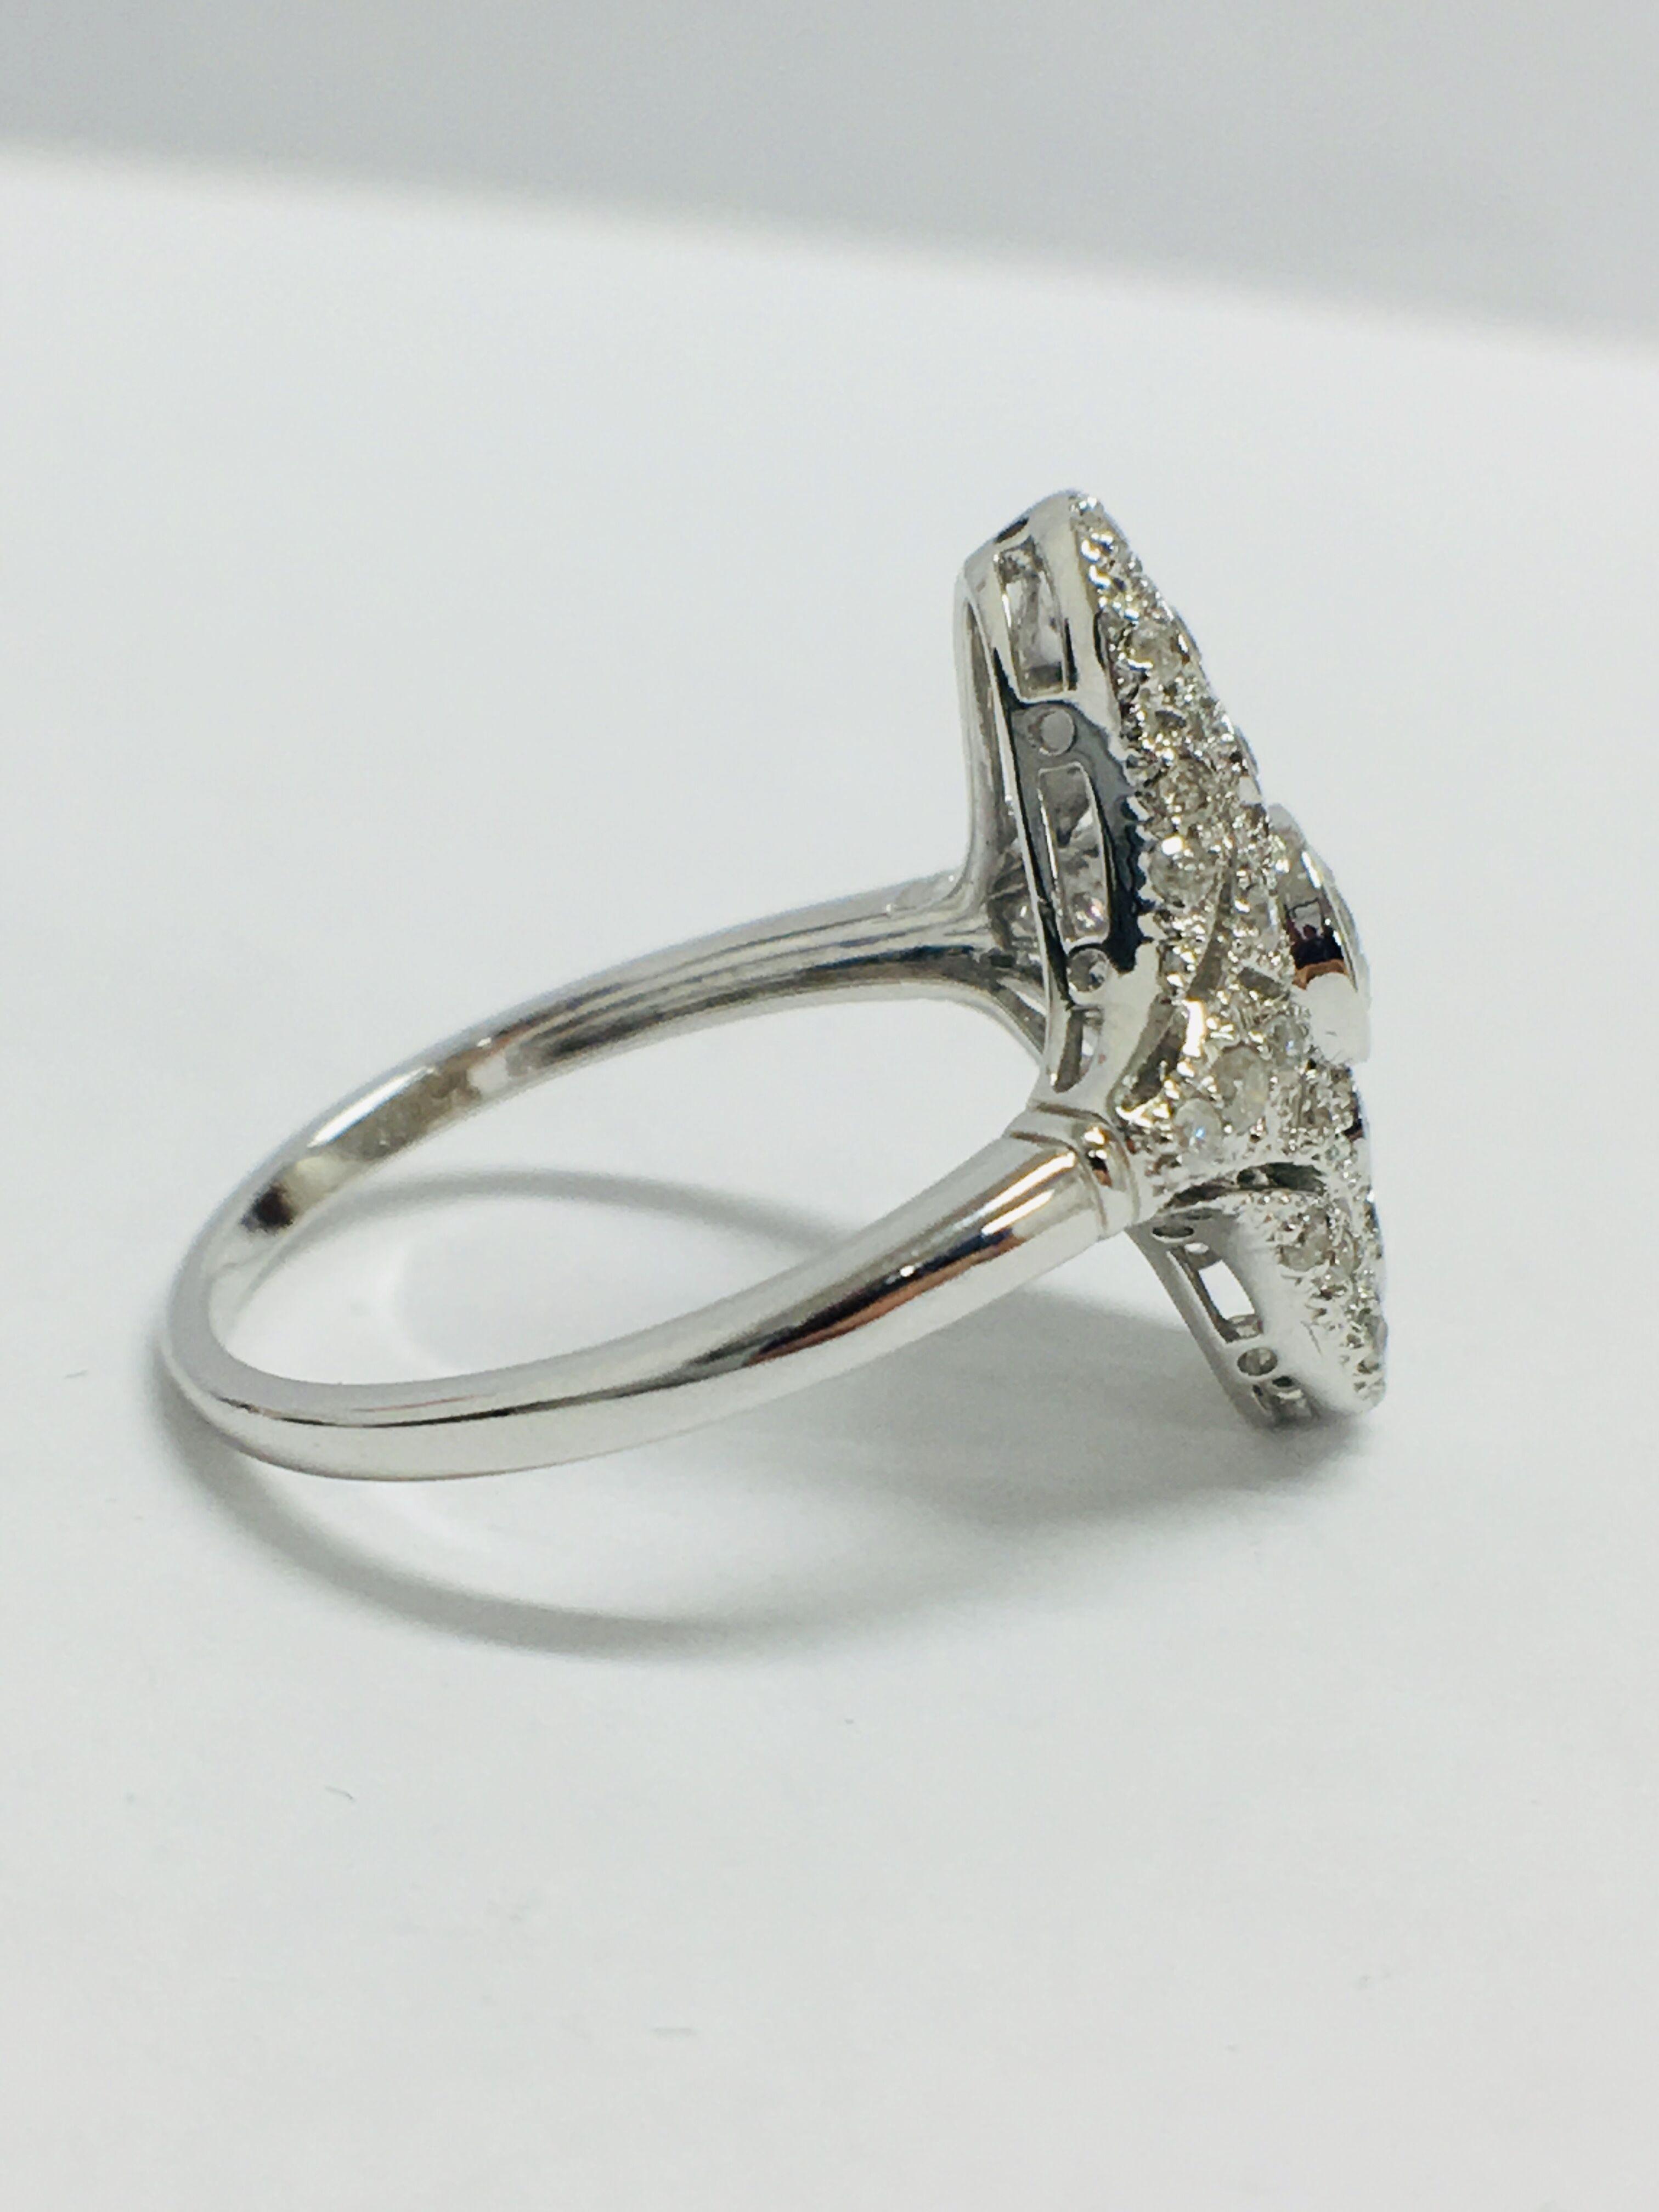 Lot 17 - 18ct White Gold Diamond Ring